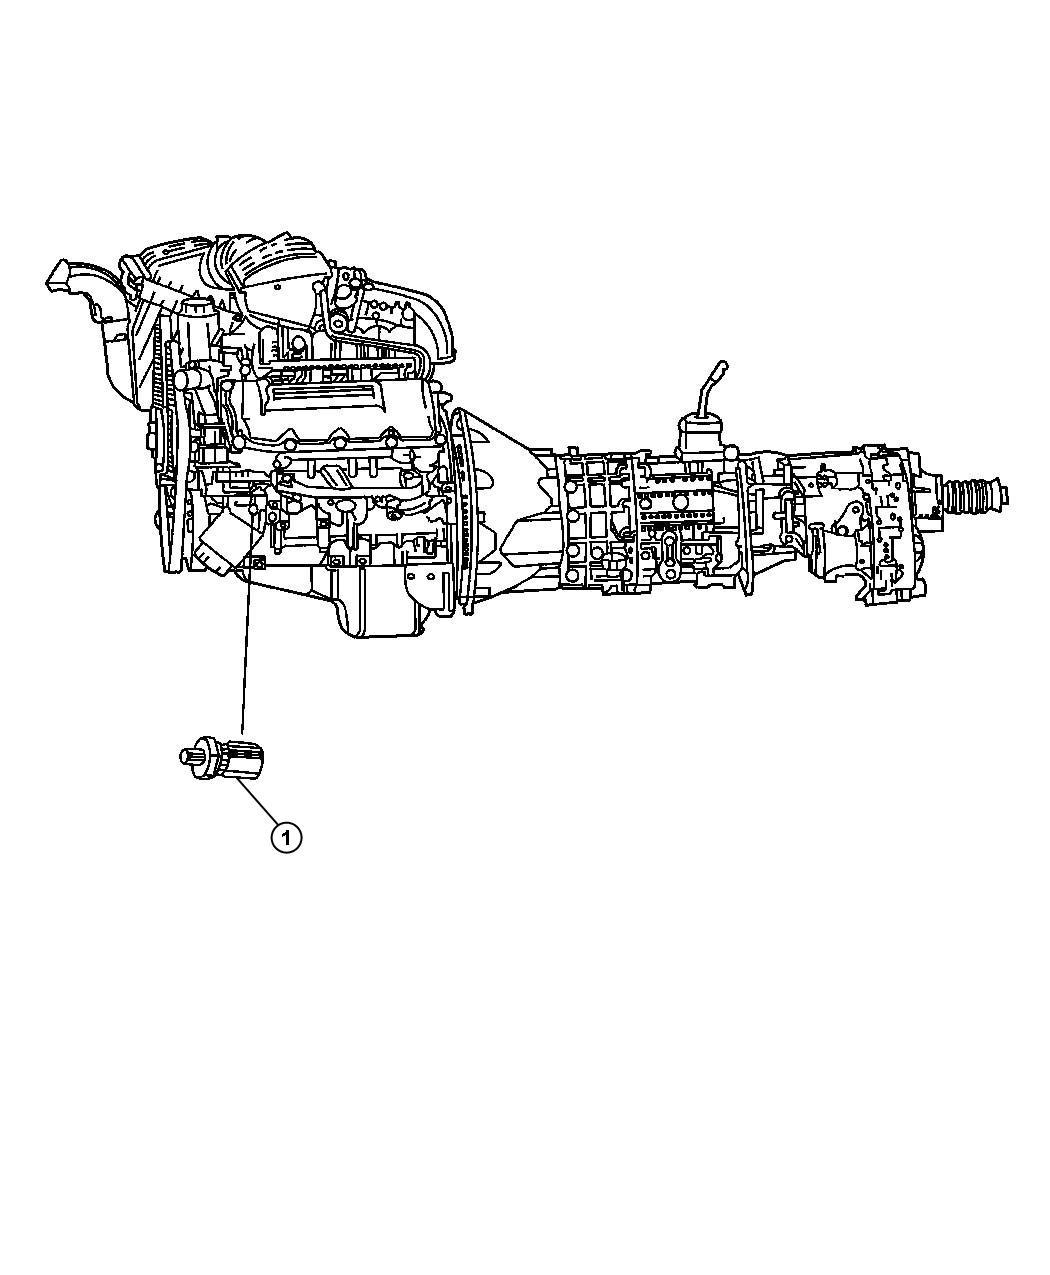 2012 Jeep Grand Cherokee Sending Unit  Oil Pressure